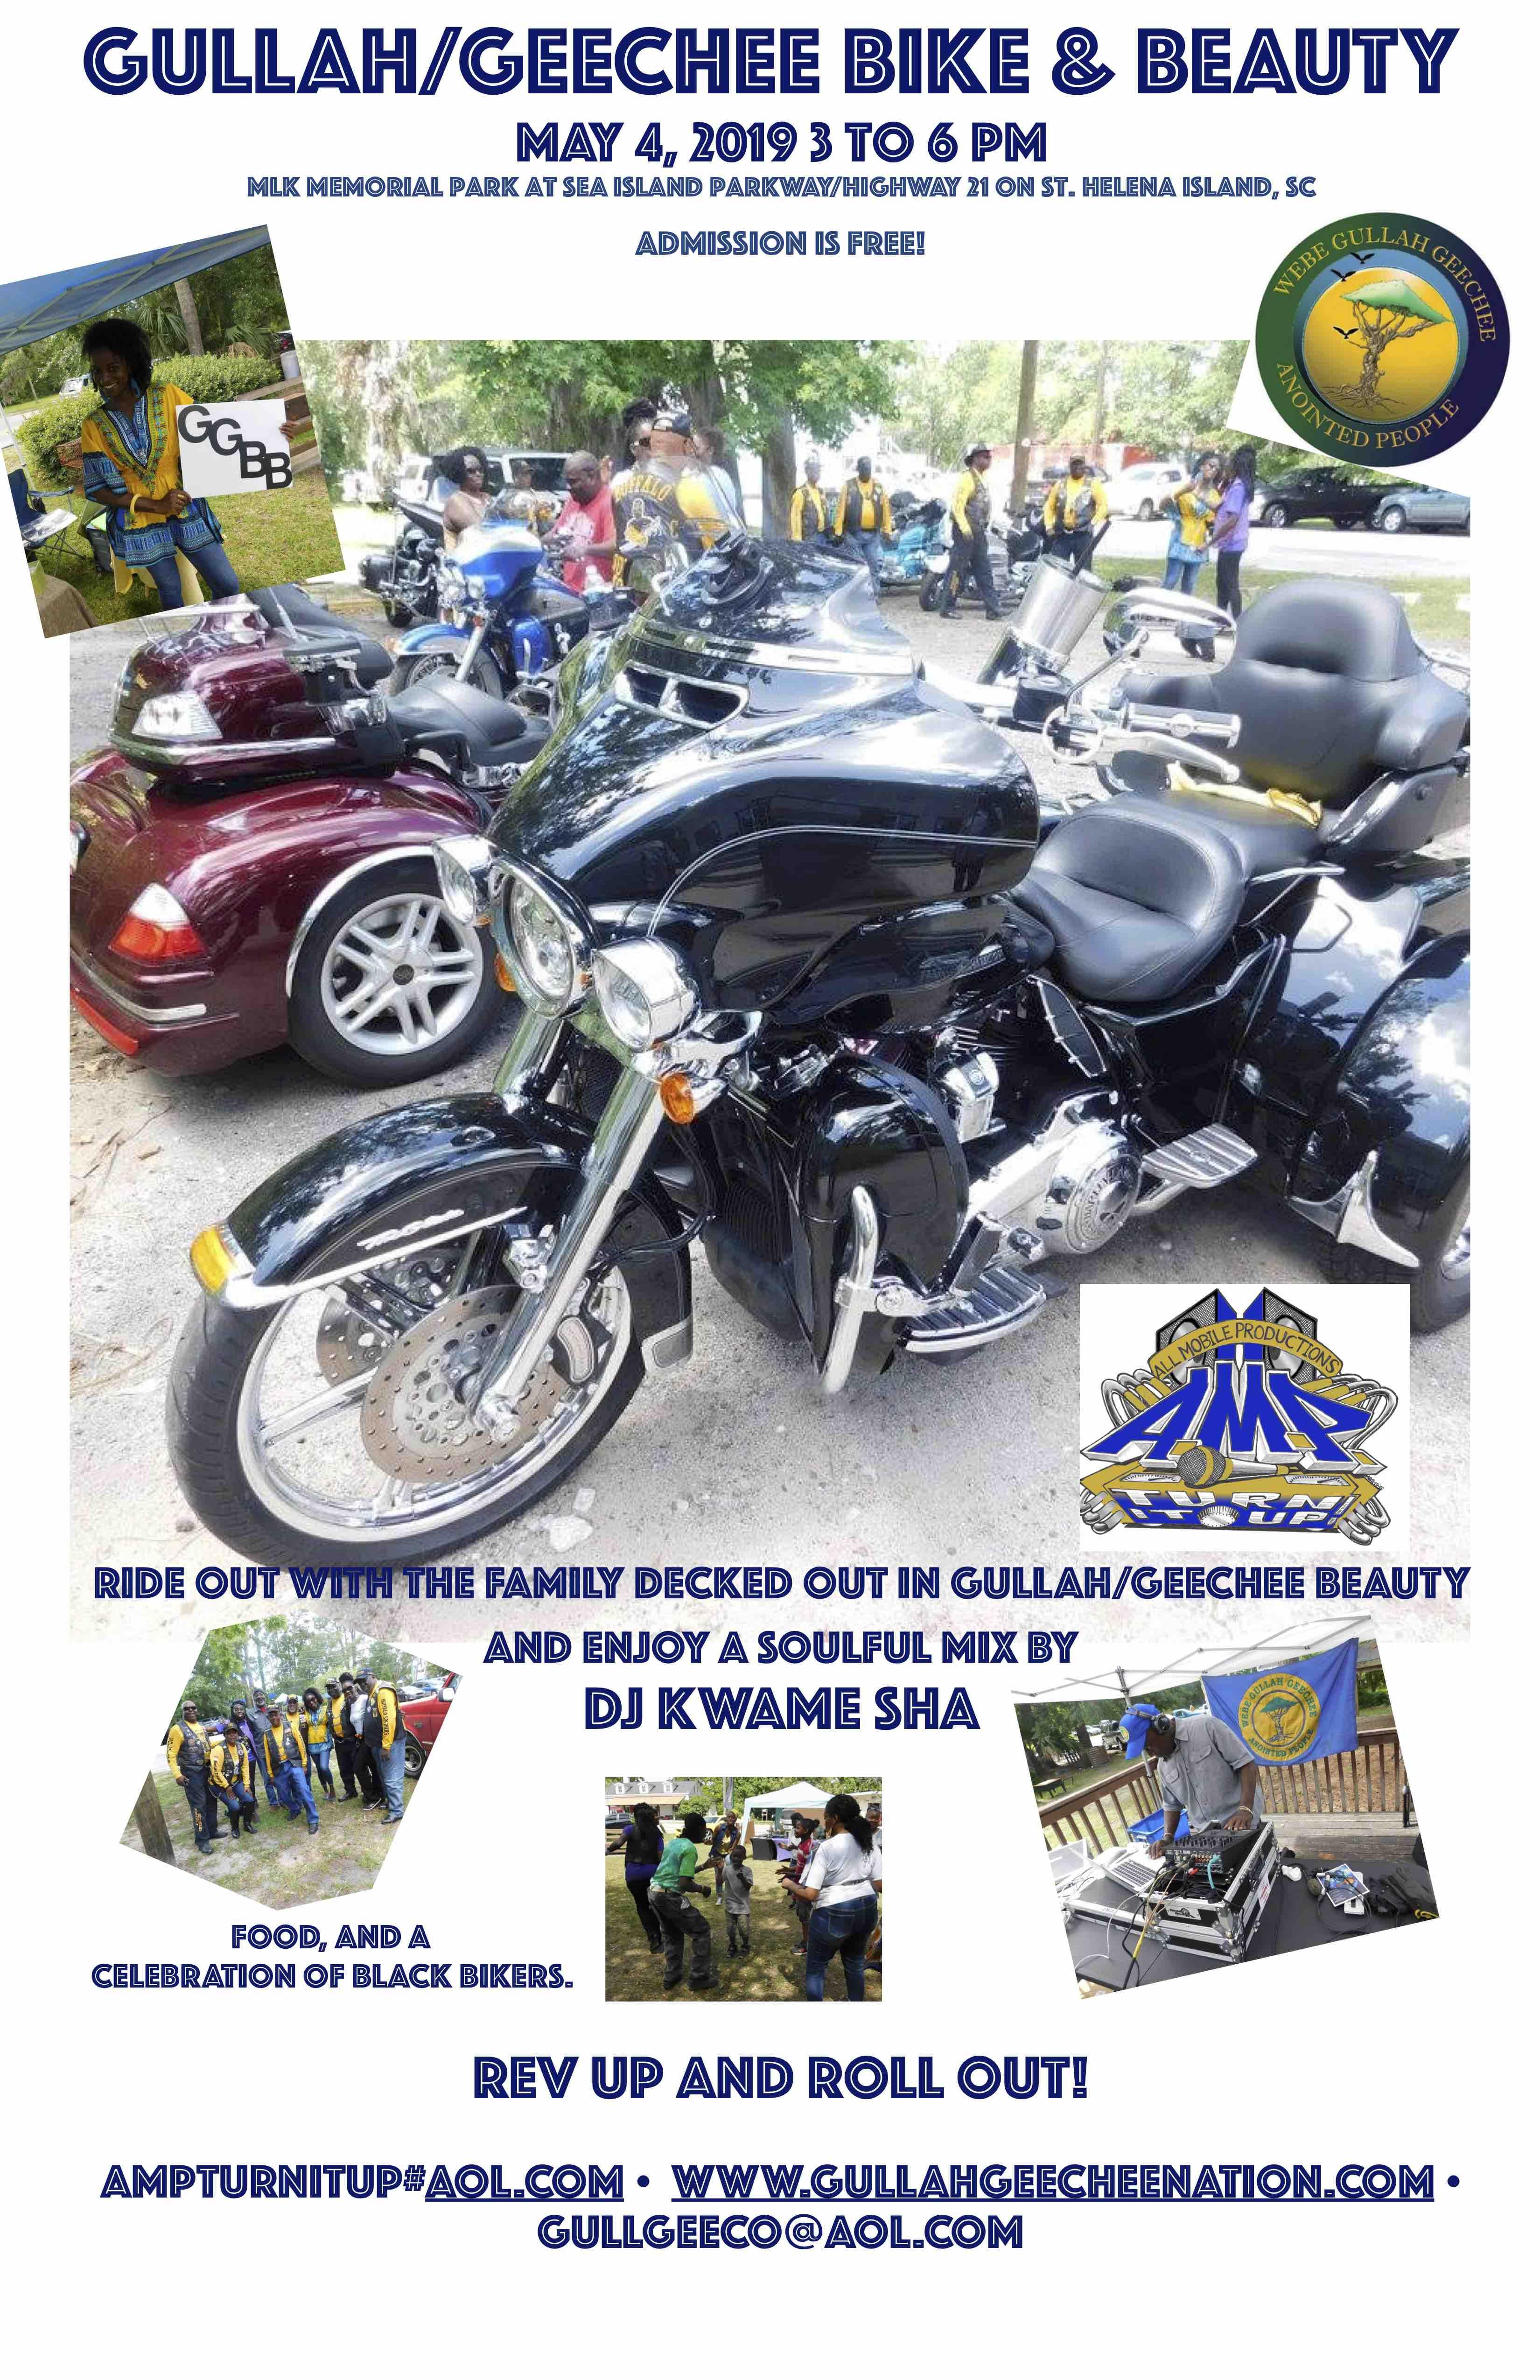 Gullah/Geechee Bike & Beauty 2019 Flyer